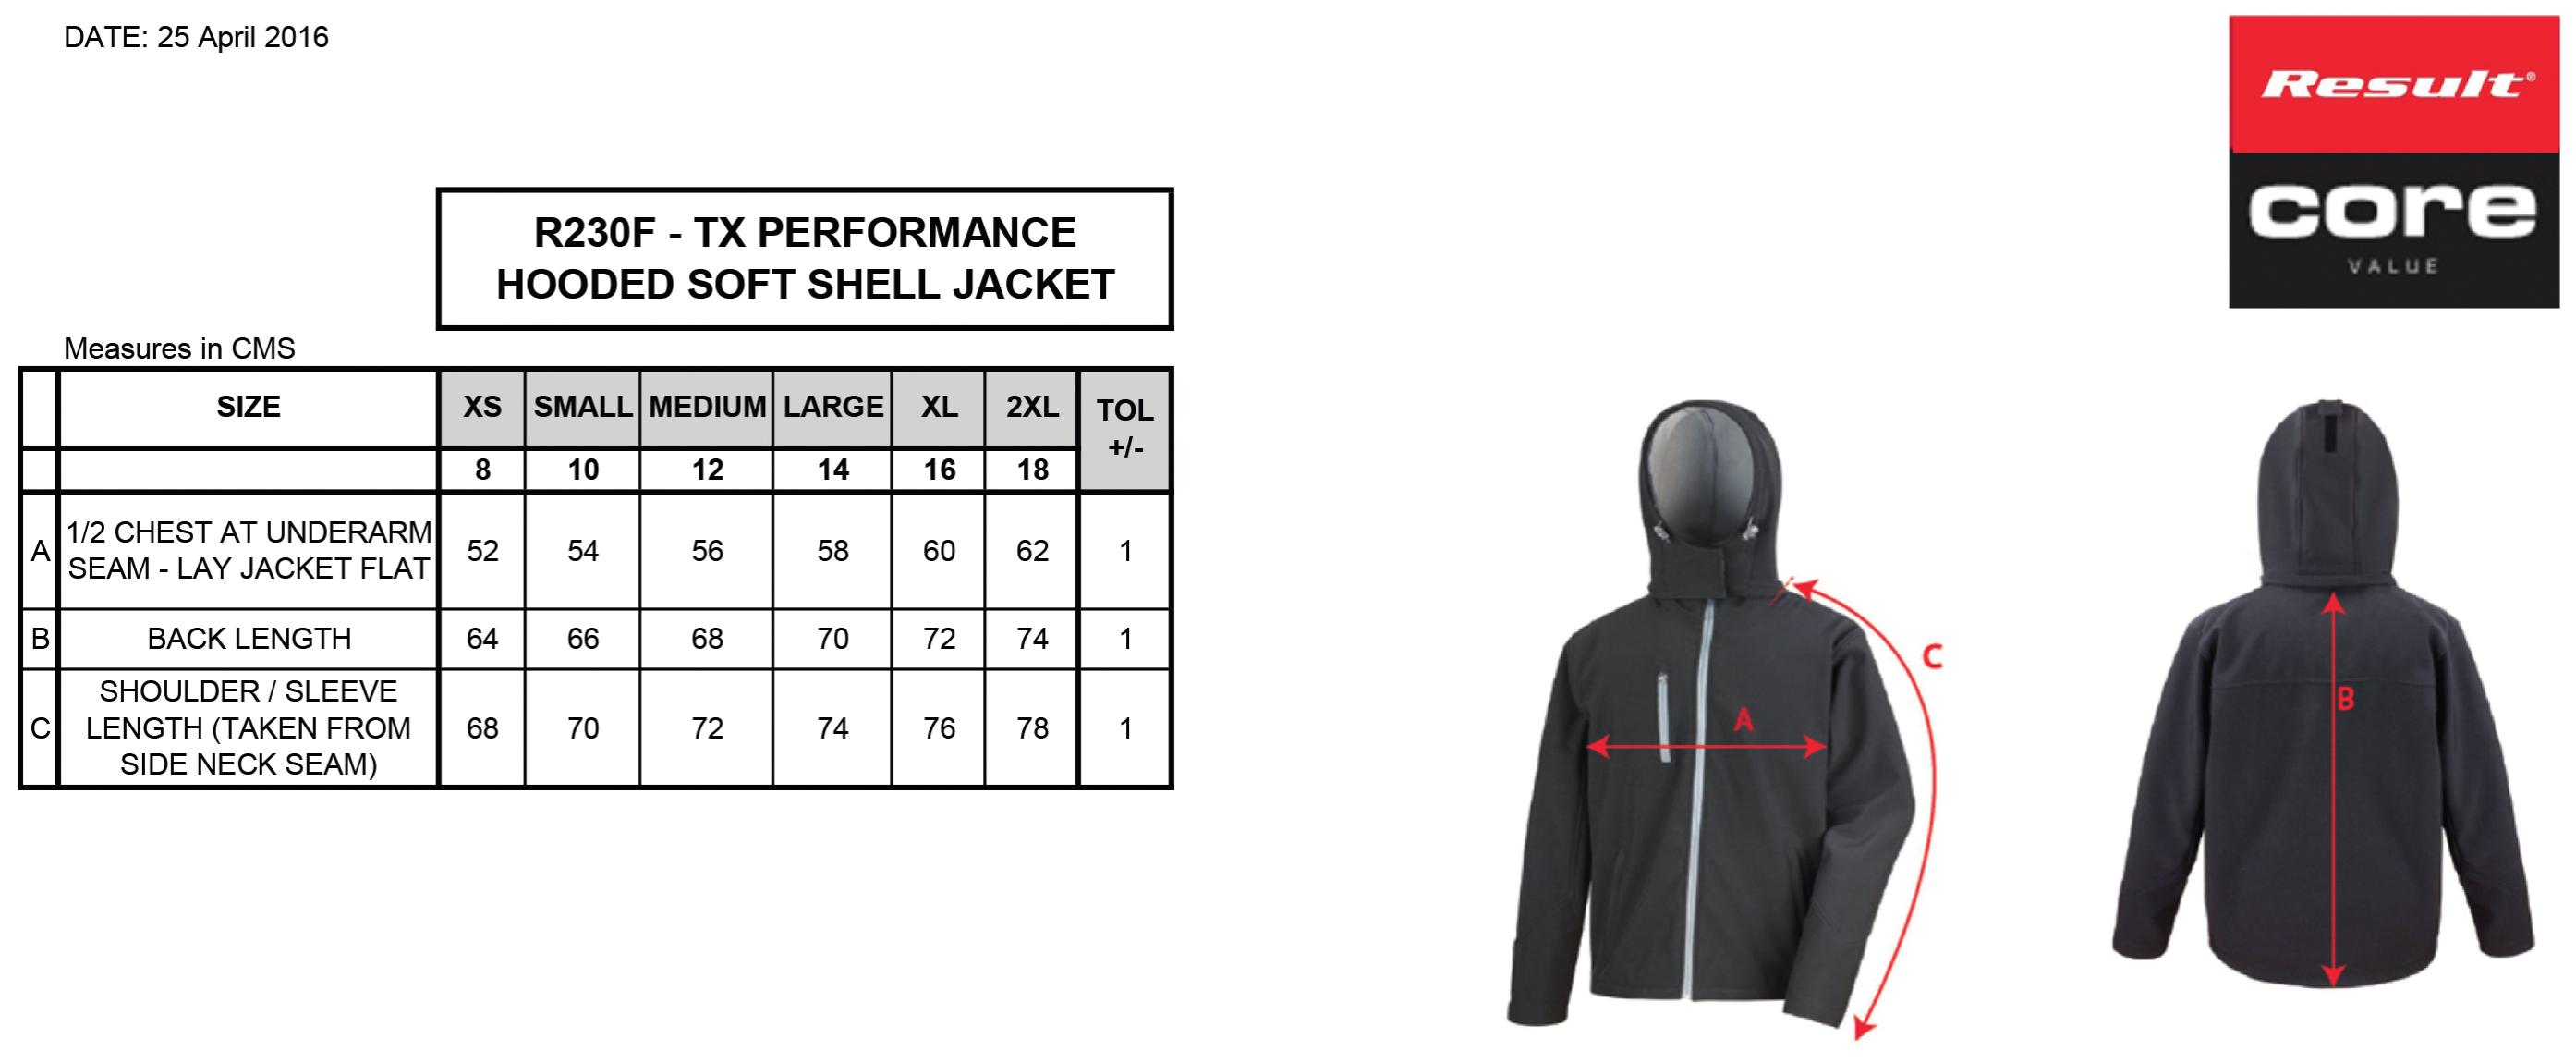 Result: Ladies TX Performance Hooded Softshell Jacket R230F